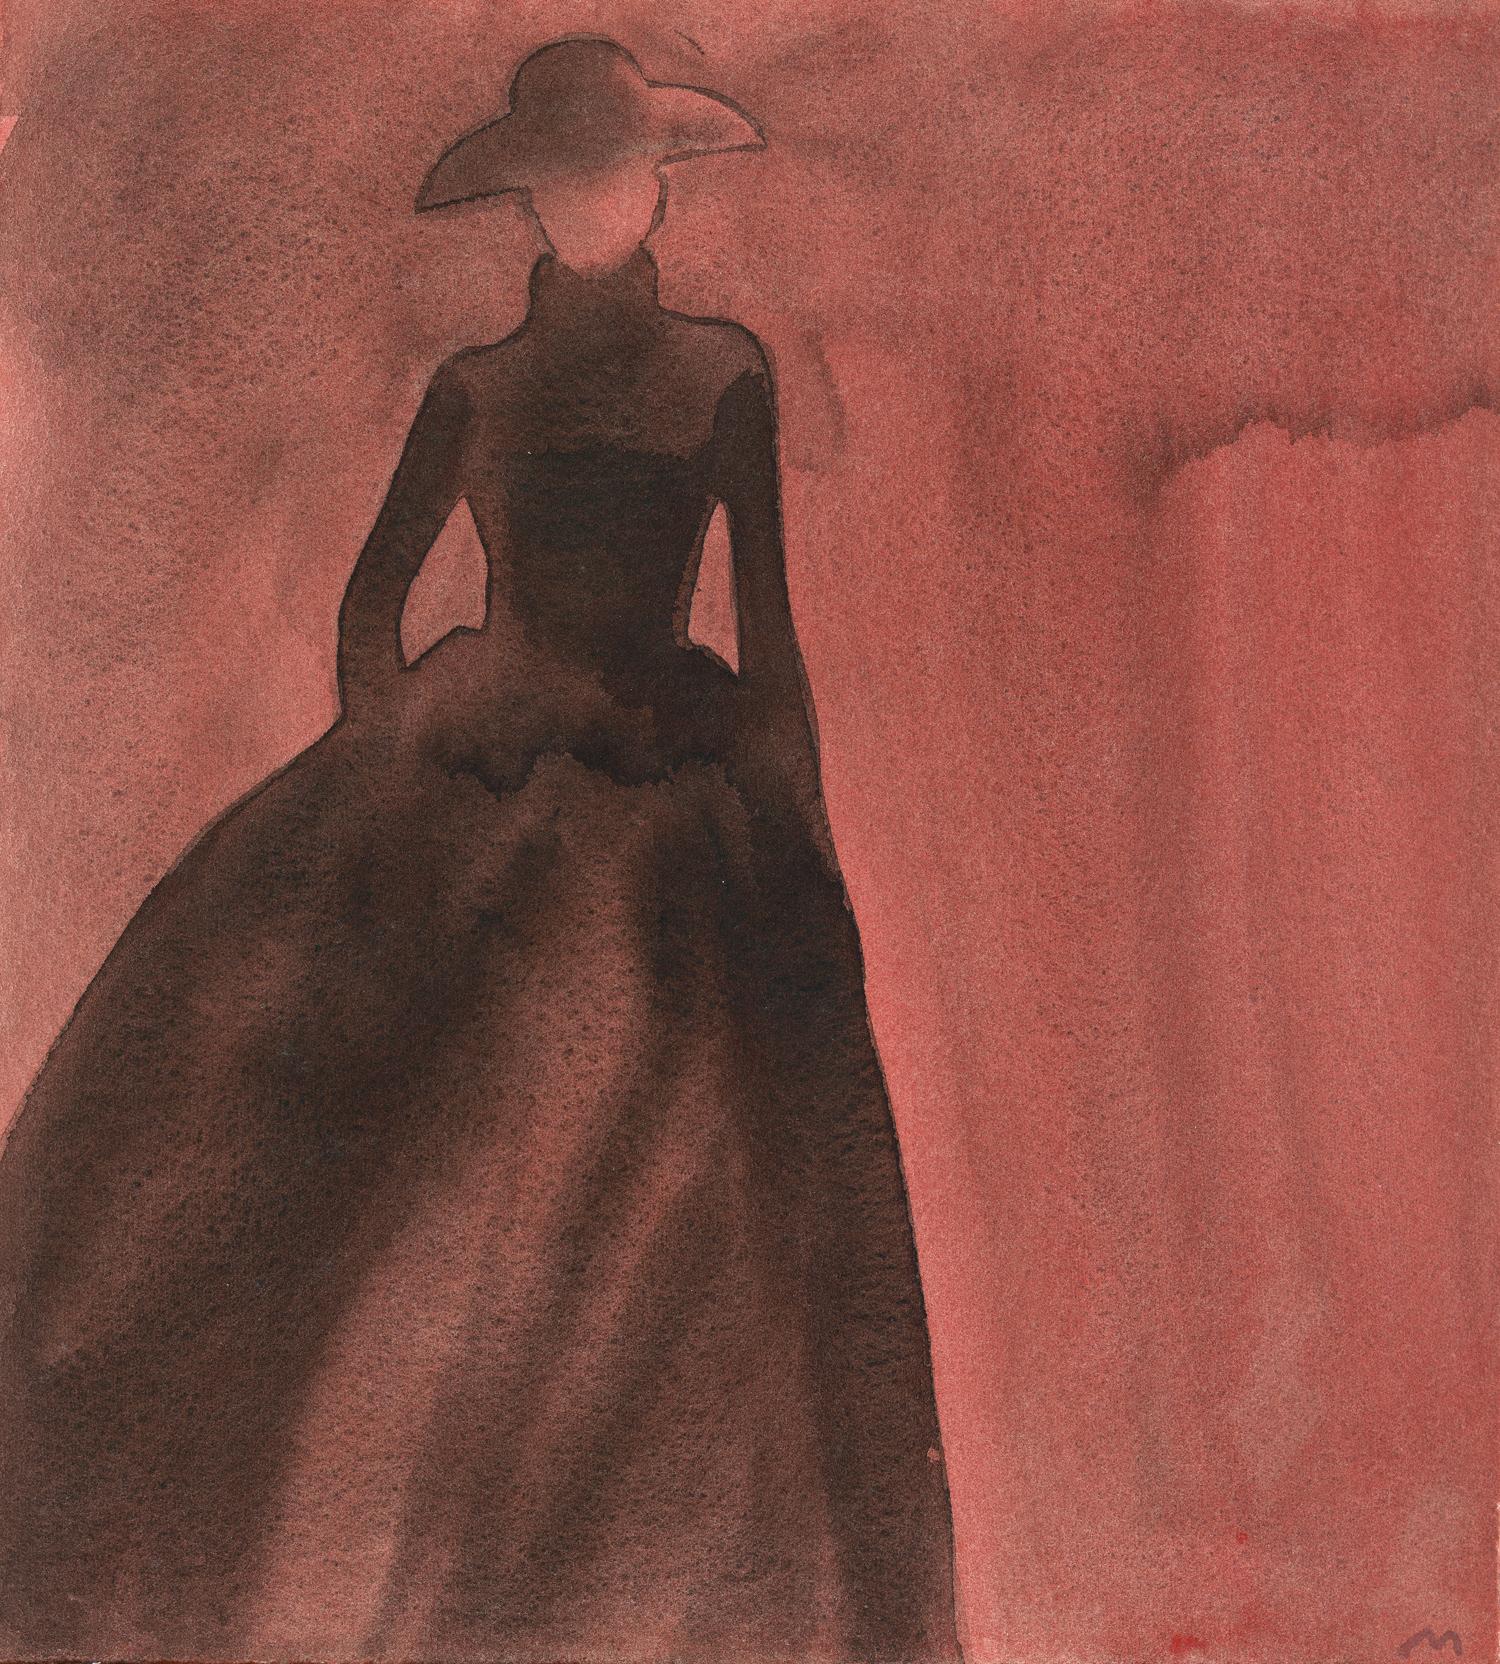 Mats Gustafson   Silhouette (Long skirt, hat)  For Yohji Yamamoto 1997 Watercolor 38 x 34 cm